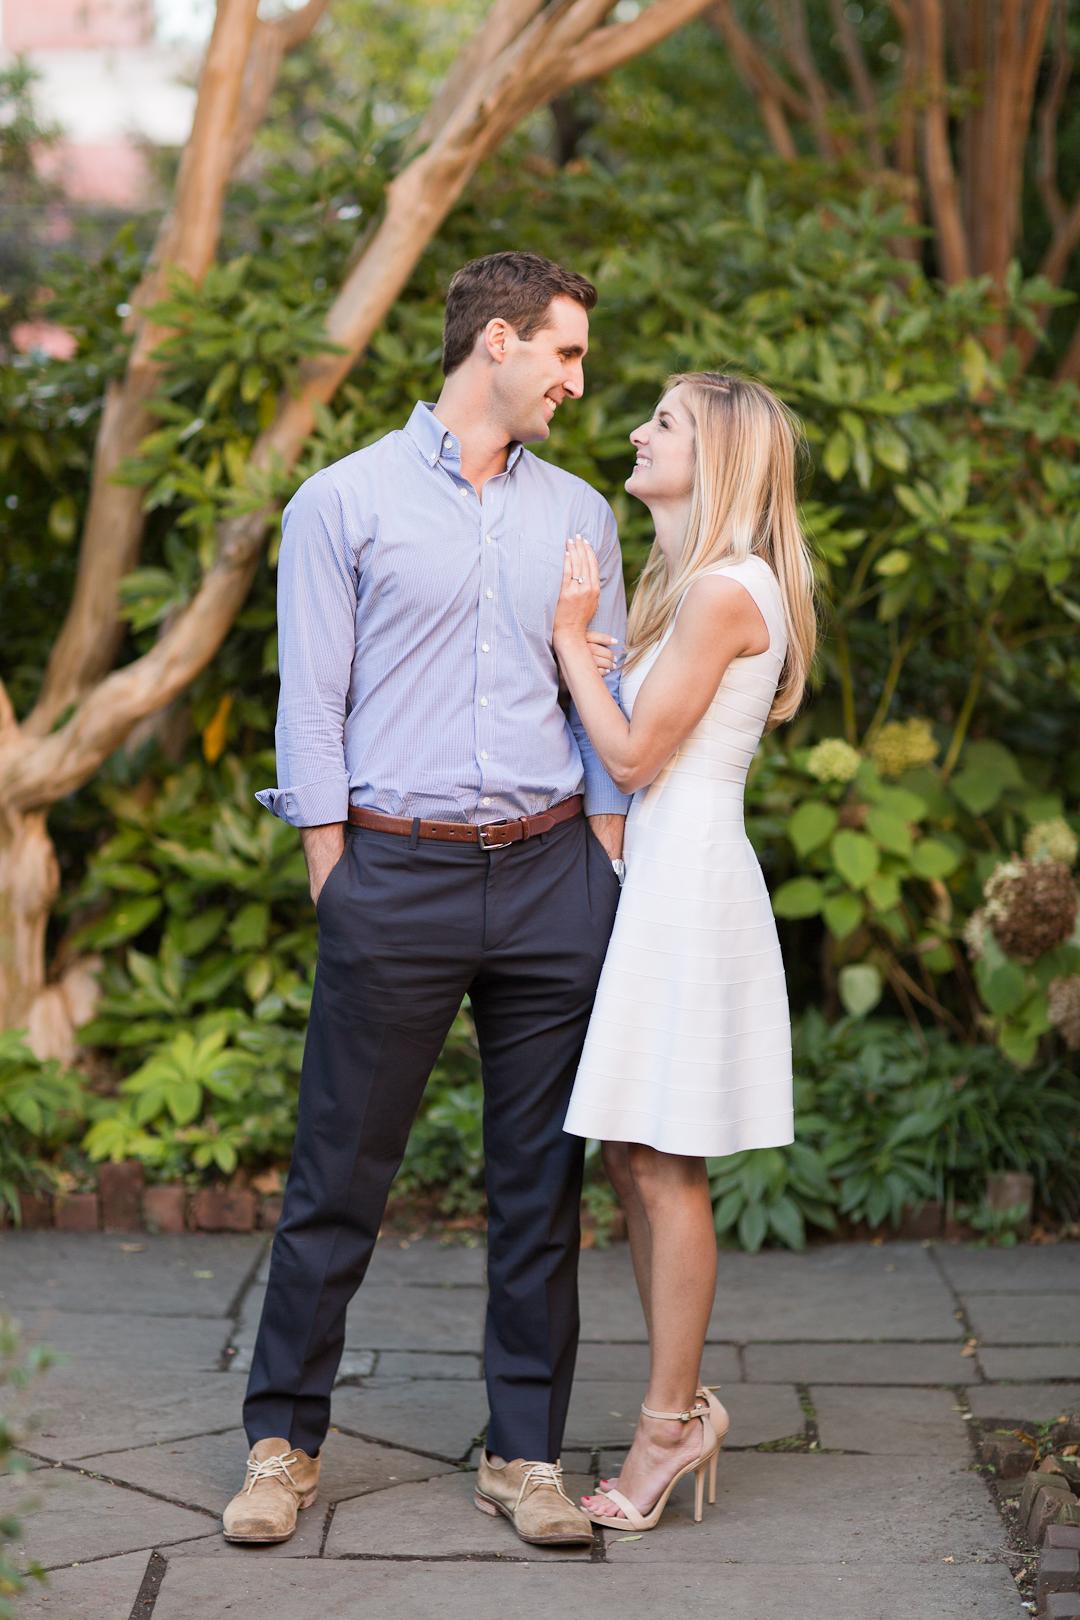 Melissa Kruse Photography - Daniece & Chris West Village Engagement Photos-78.jpg